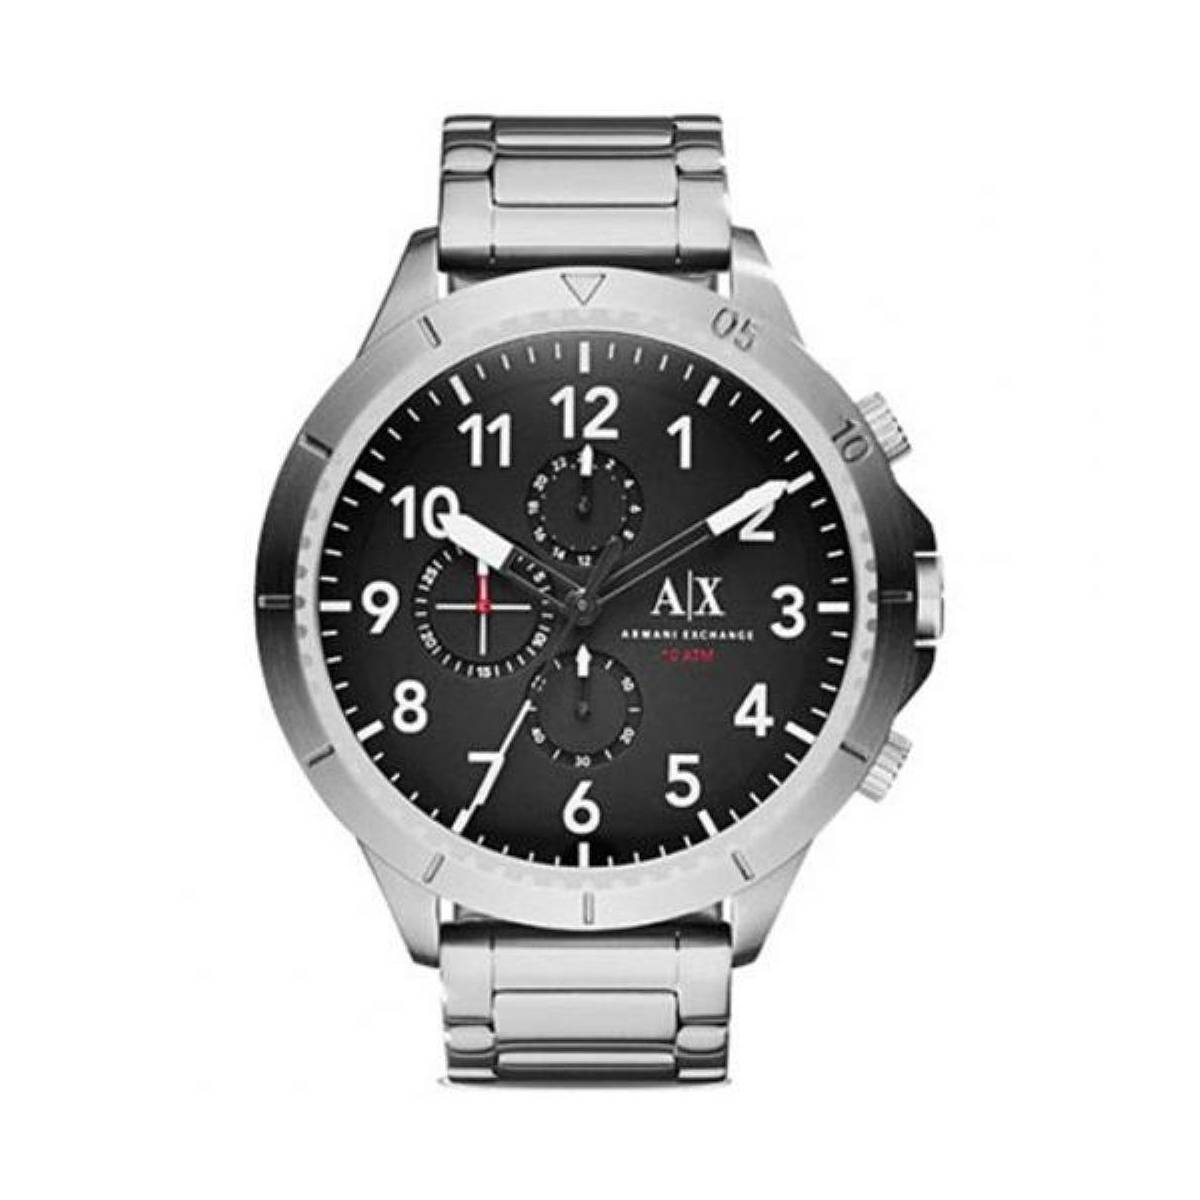 Relógio Armani Exchange Masculino Quartz AX1750/1PN